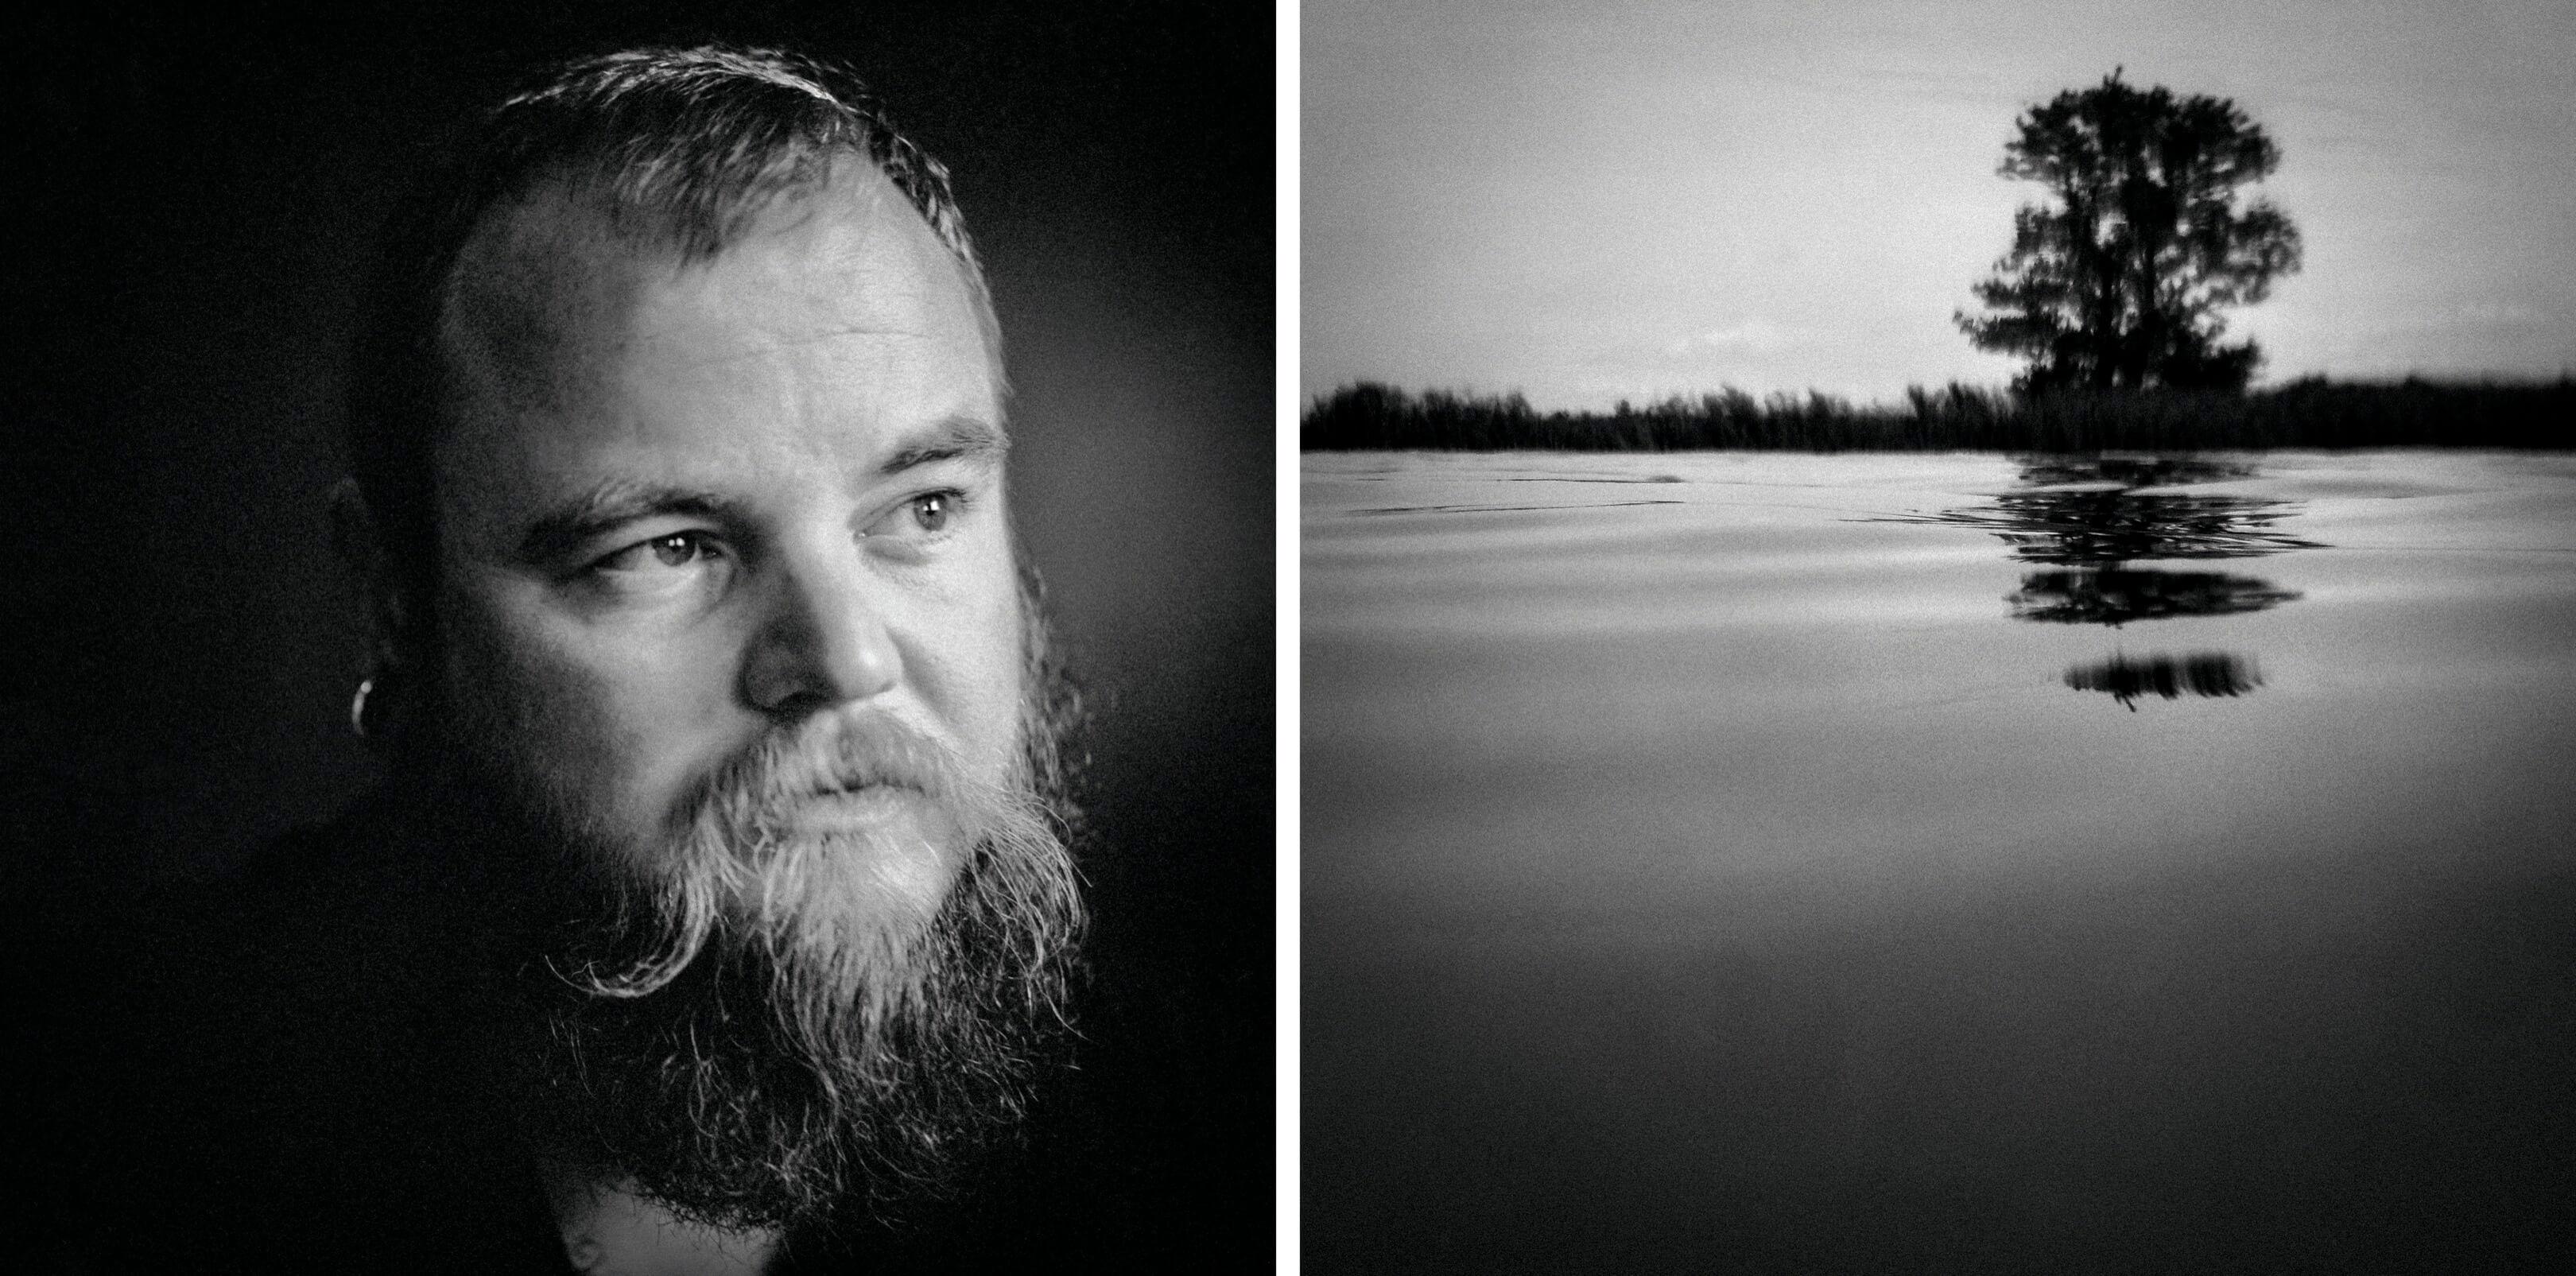 Chris Jurjen Poeles Fotografie Jur portret landschap fragment adempauze windstil staren in de stilte ademloos zwart wit zw kunst kunstfotografie